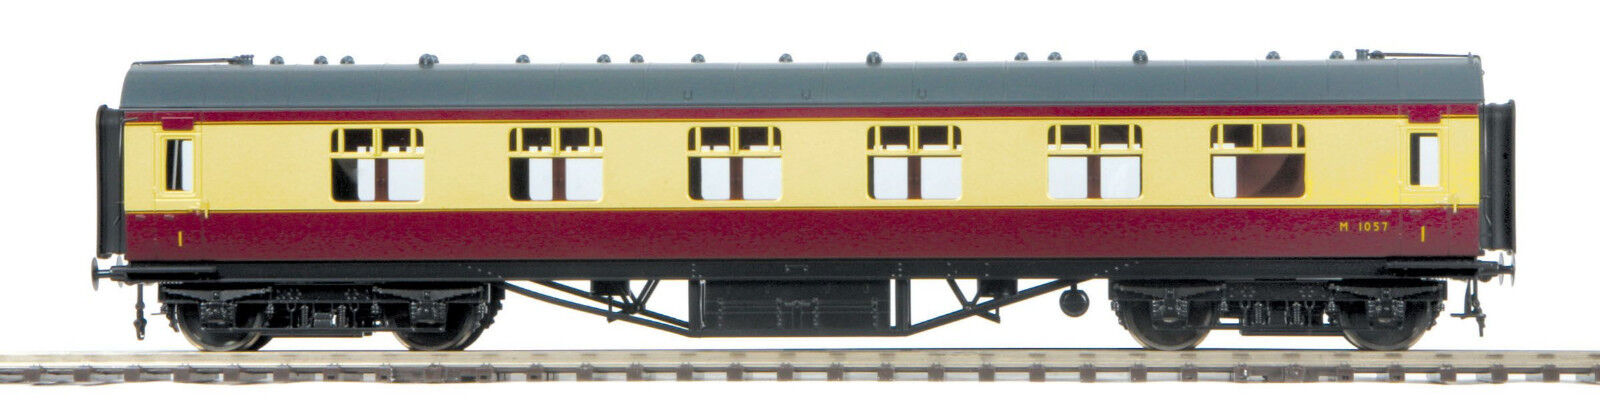 MTH British Railways Passenger Car for NEM Fine Scale 22-60049